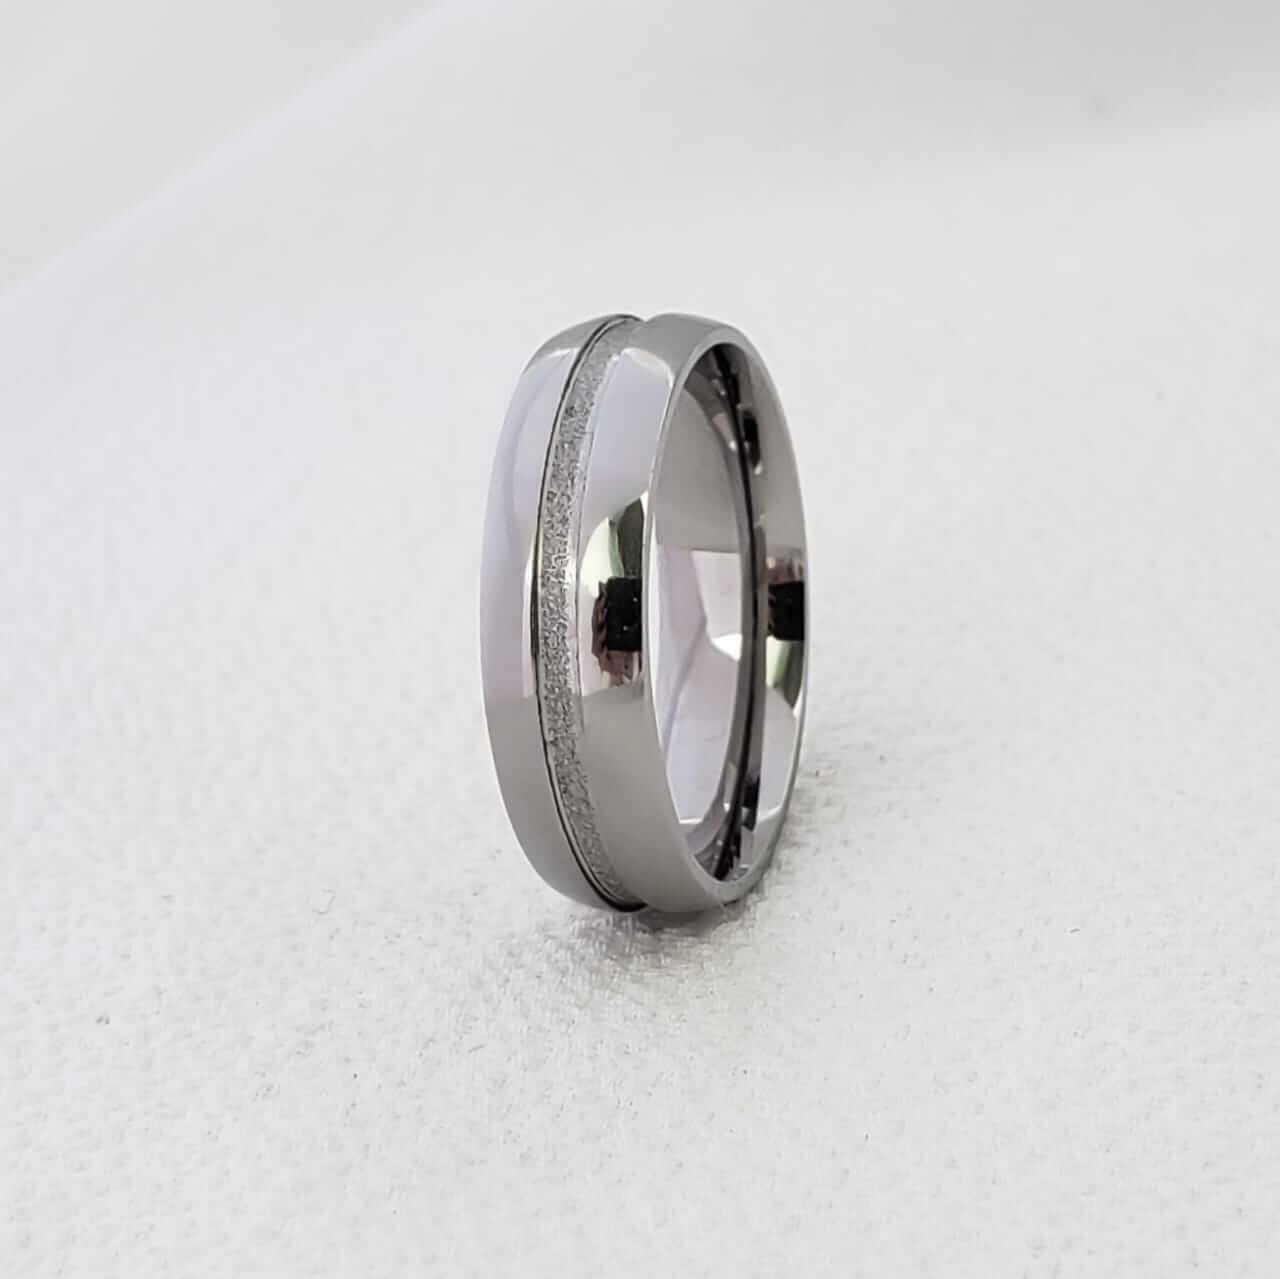 Aliança Cecilia 238 em Aço Inox 6mm (Masculina)